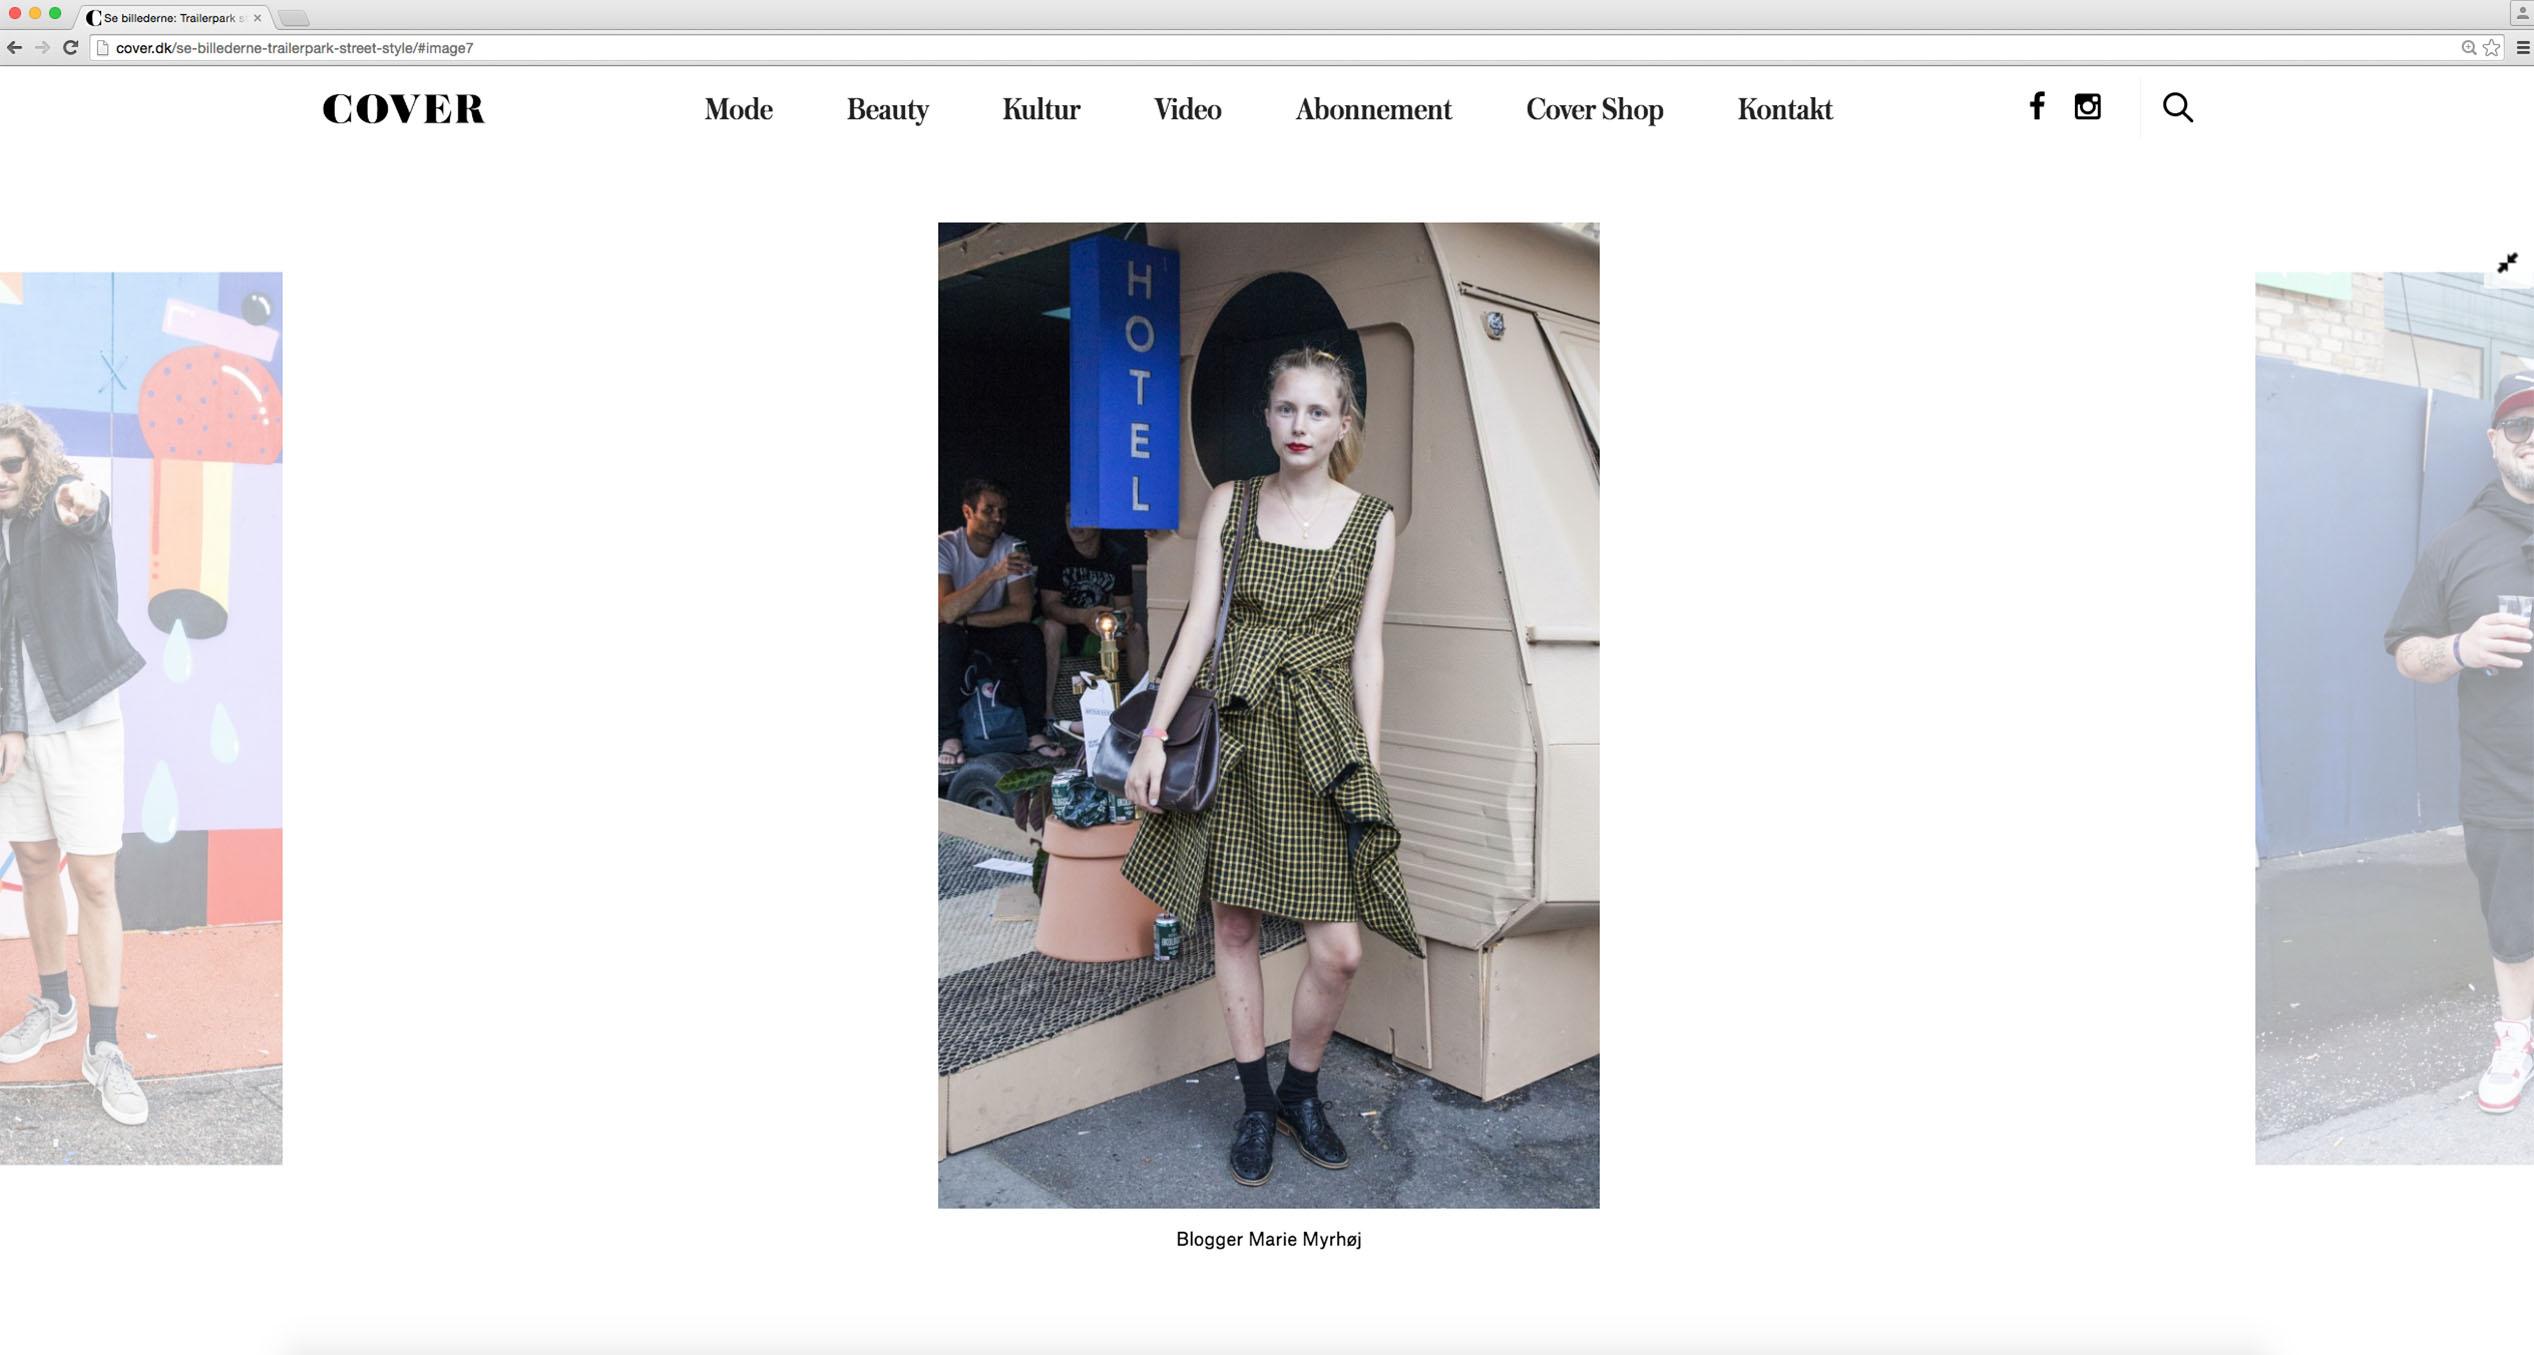 Streetstyle_CoverMagazine_TrailerparkFestival2016_7